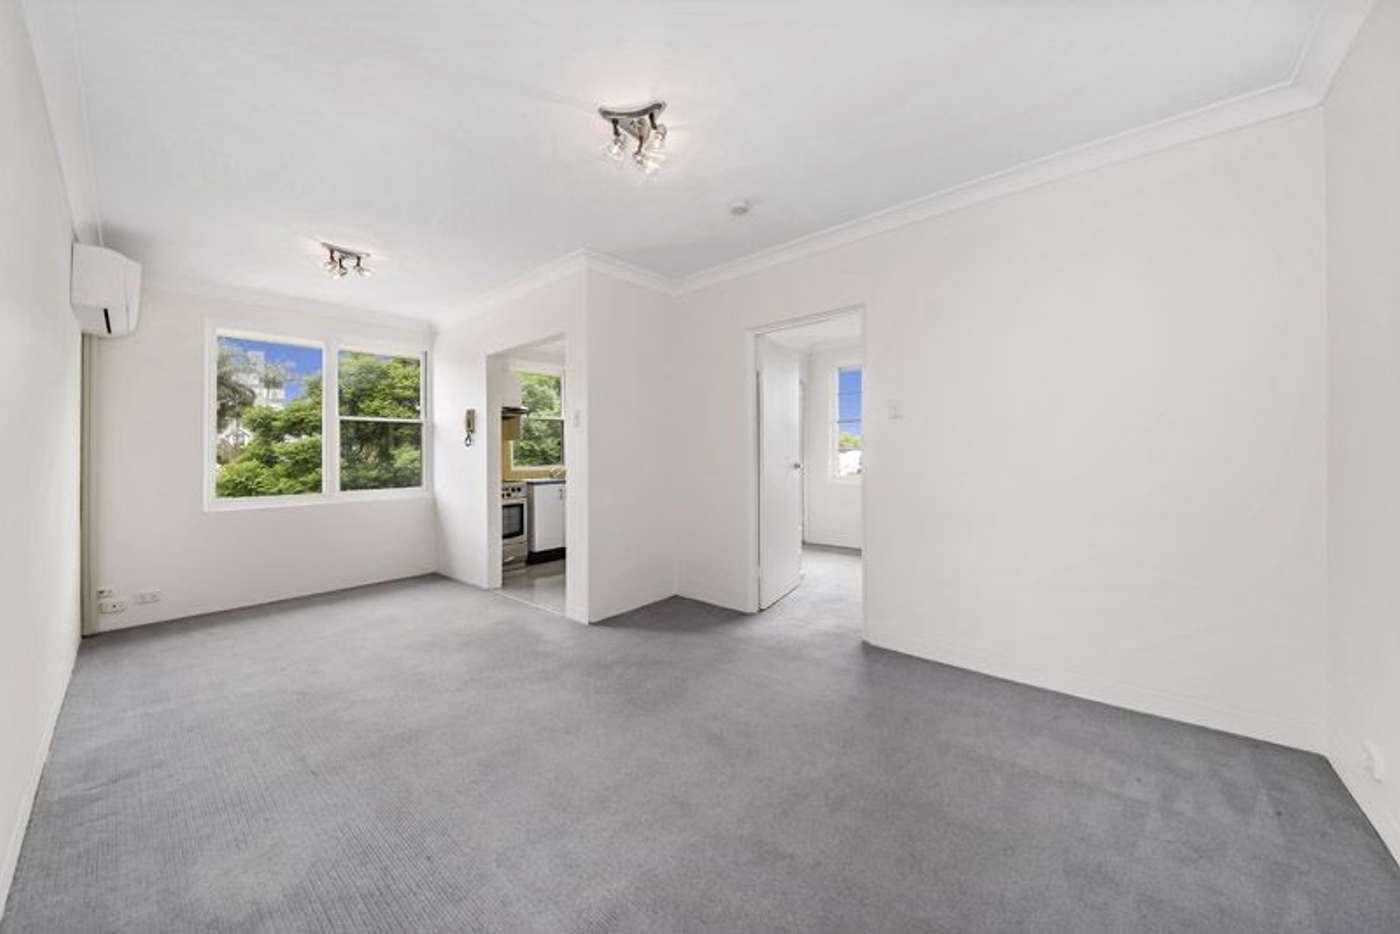 Main view of Homely apartment listing, 14/70 Underwood Street, Paddington NSW 2021